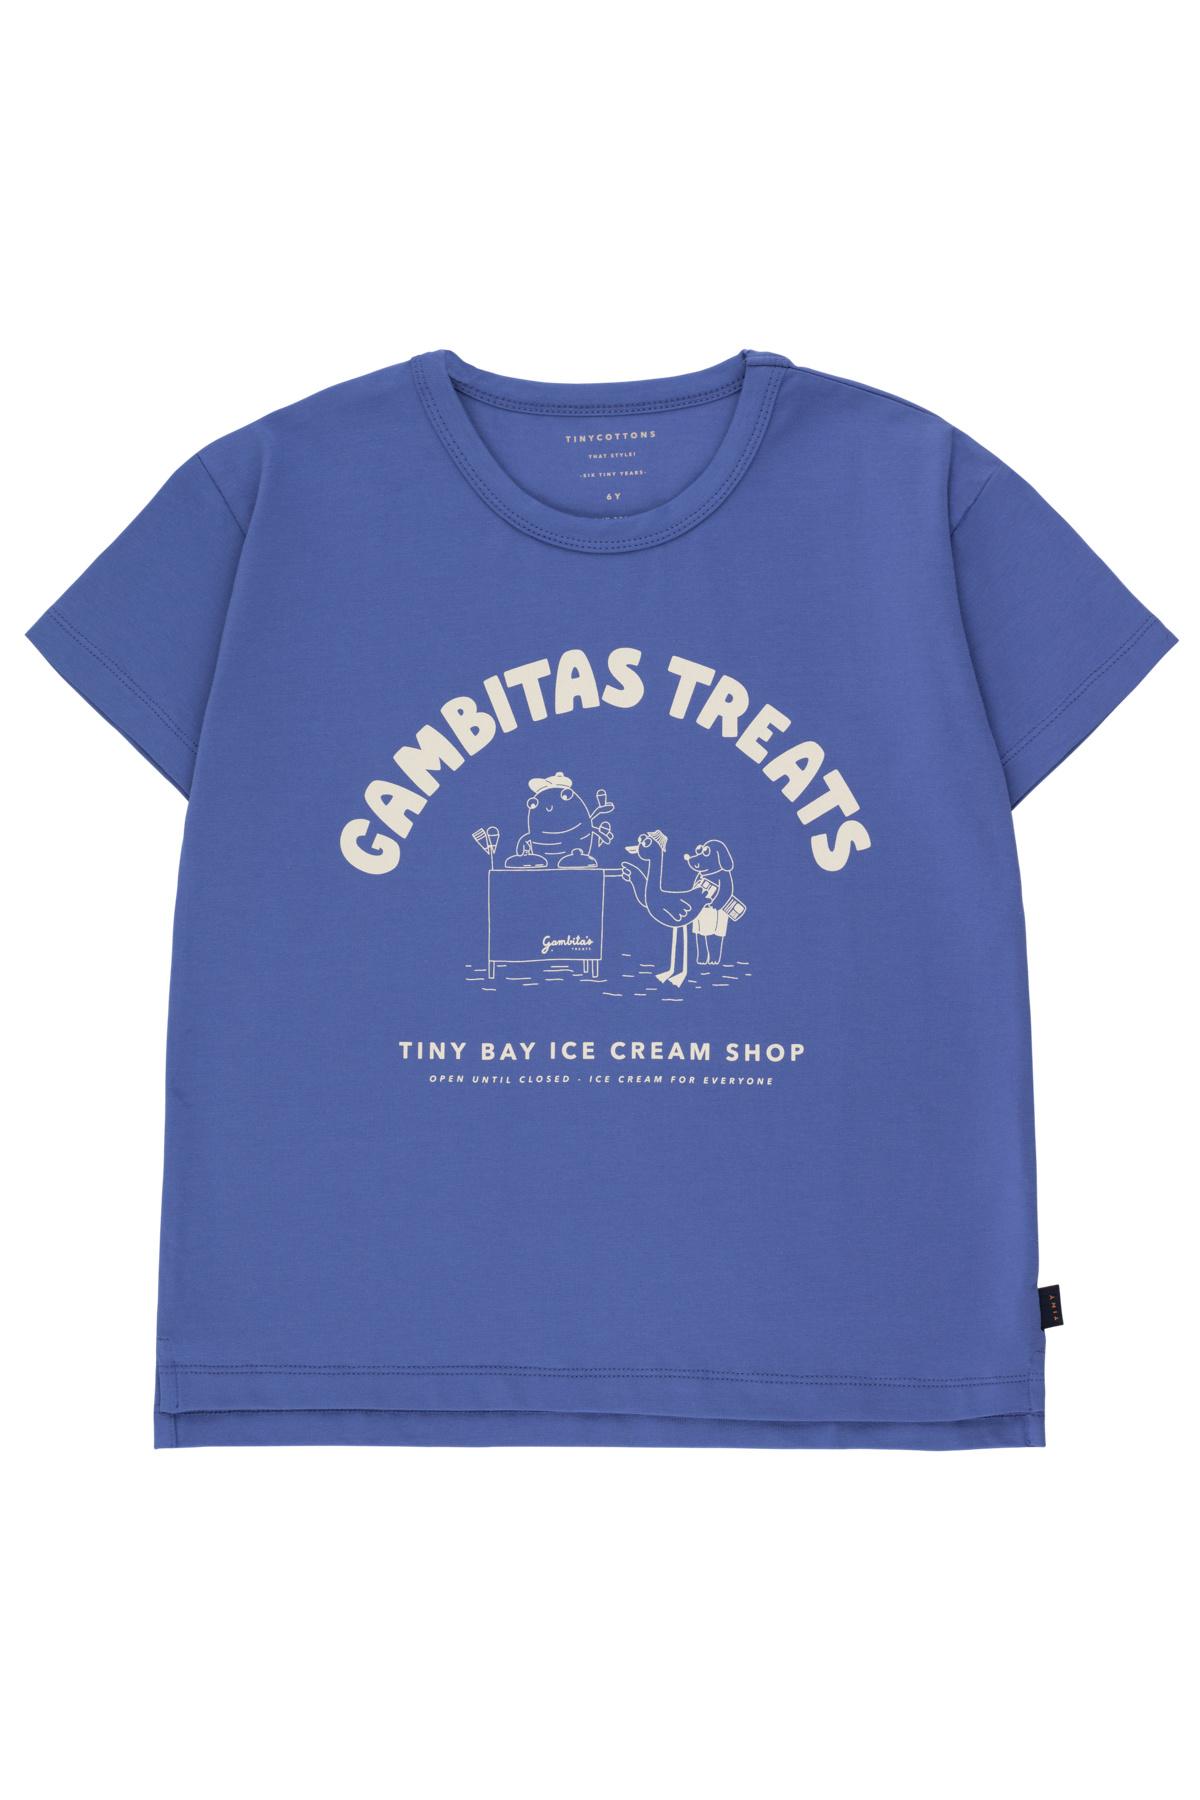 Gambitas treats tee - Iris Blue / Light Cream-1